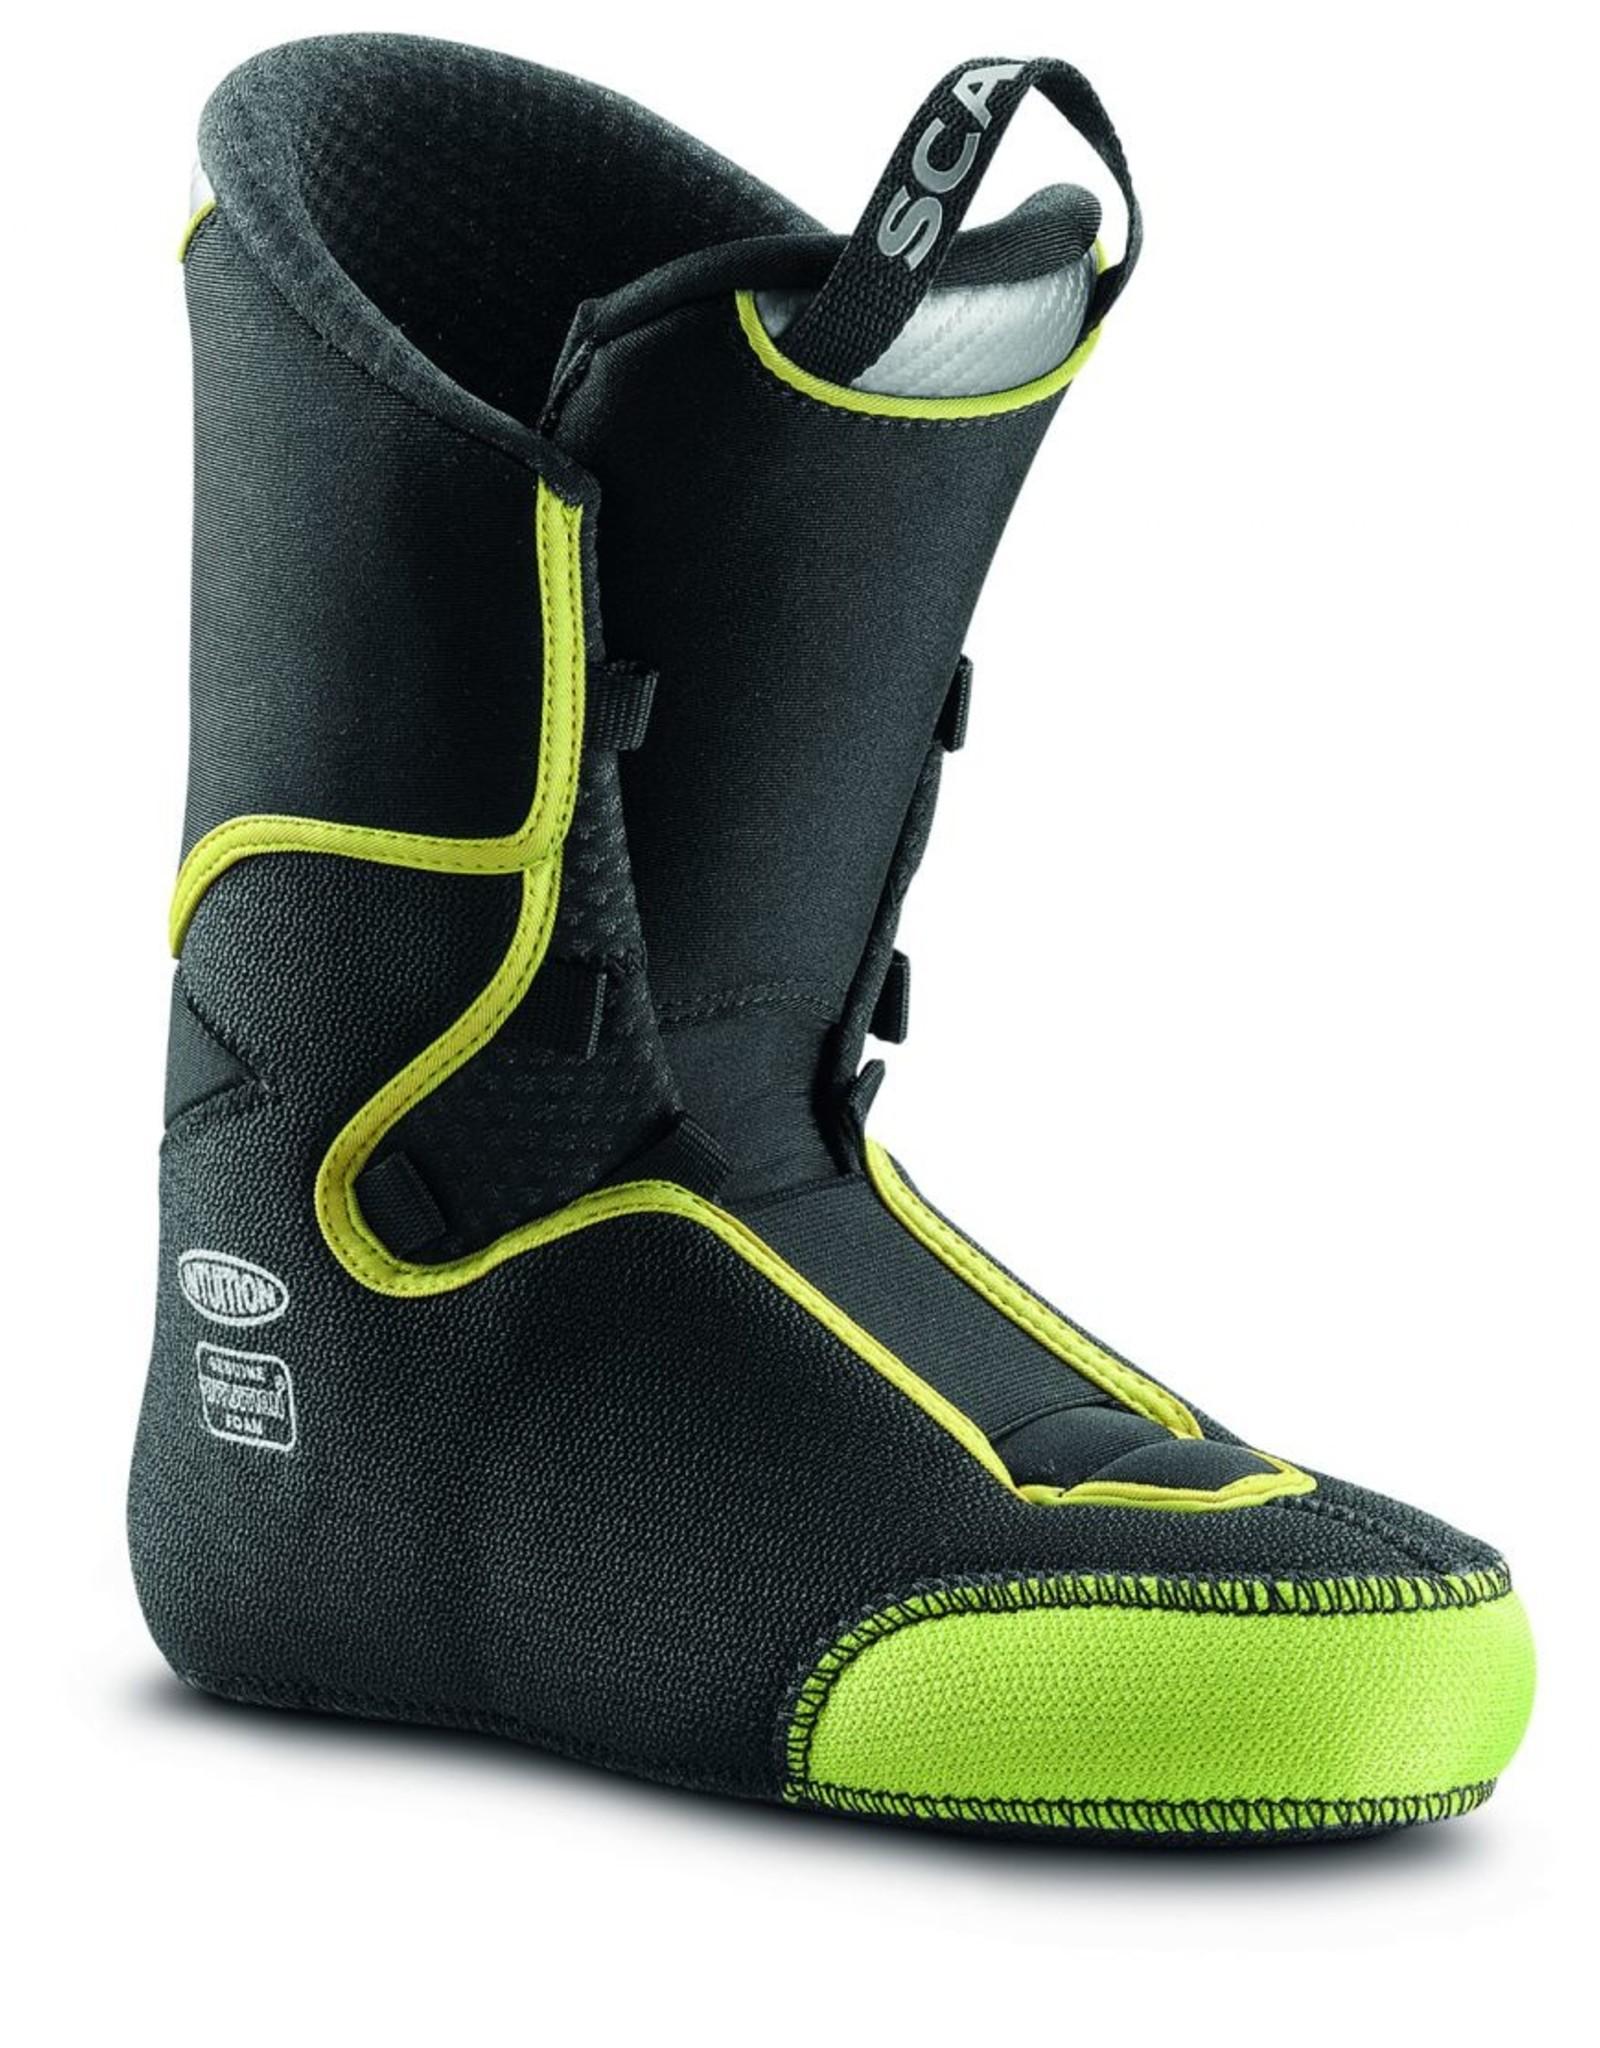 Scarpa Scarpa 2022 T2 Eco 75mm Tele Ski Boots